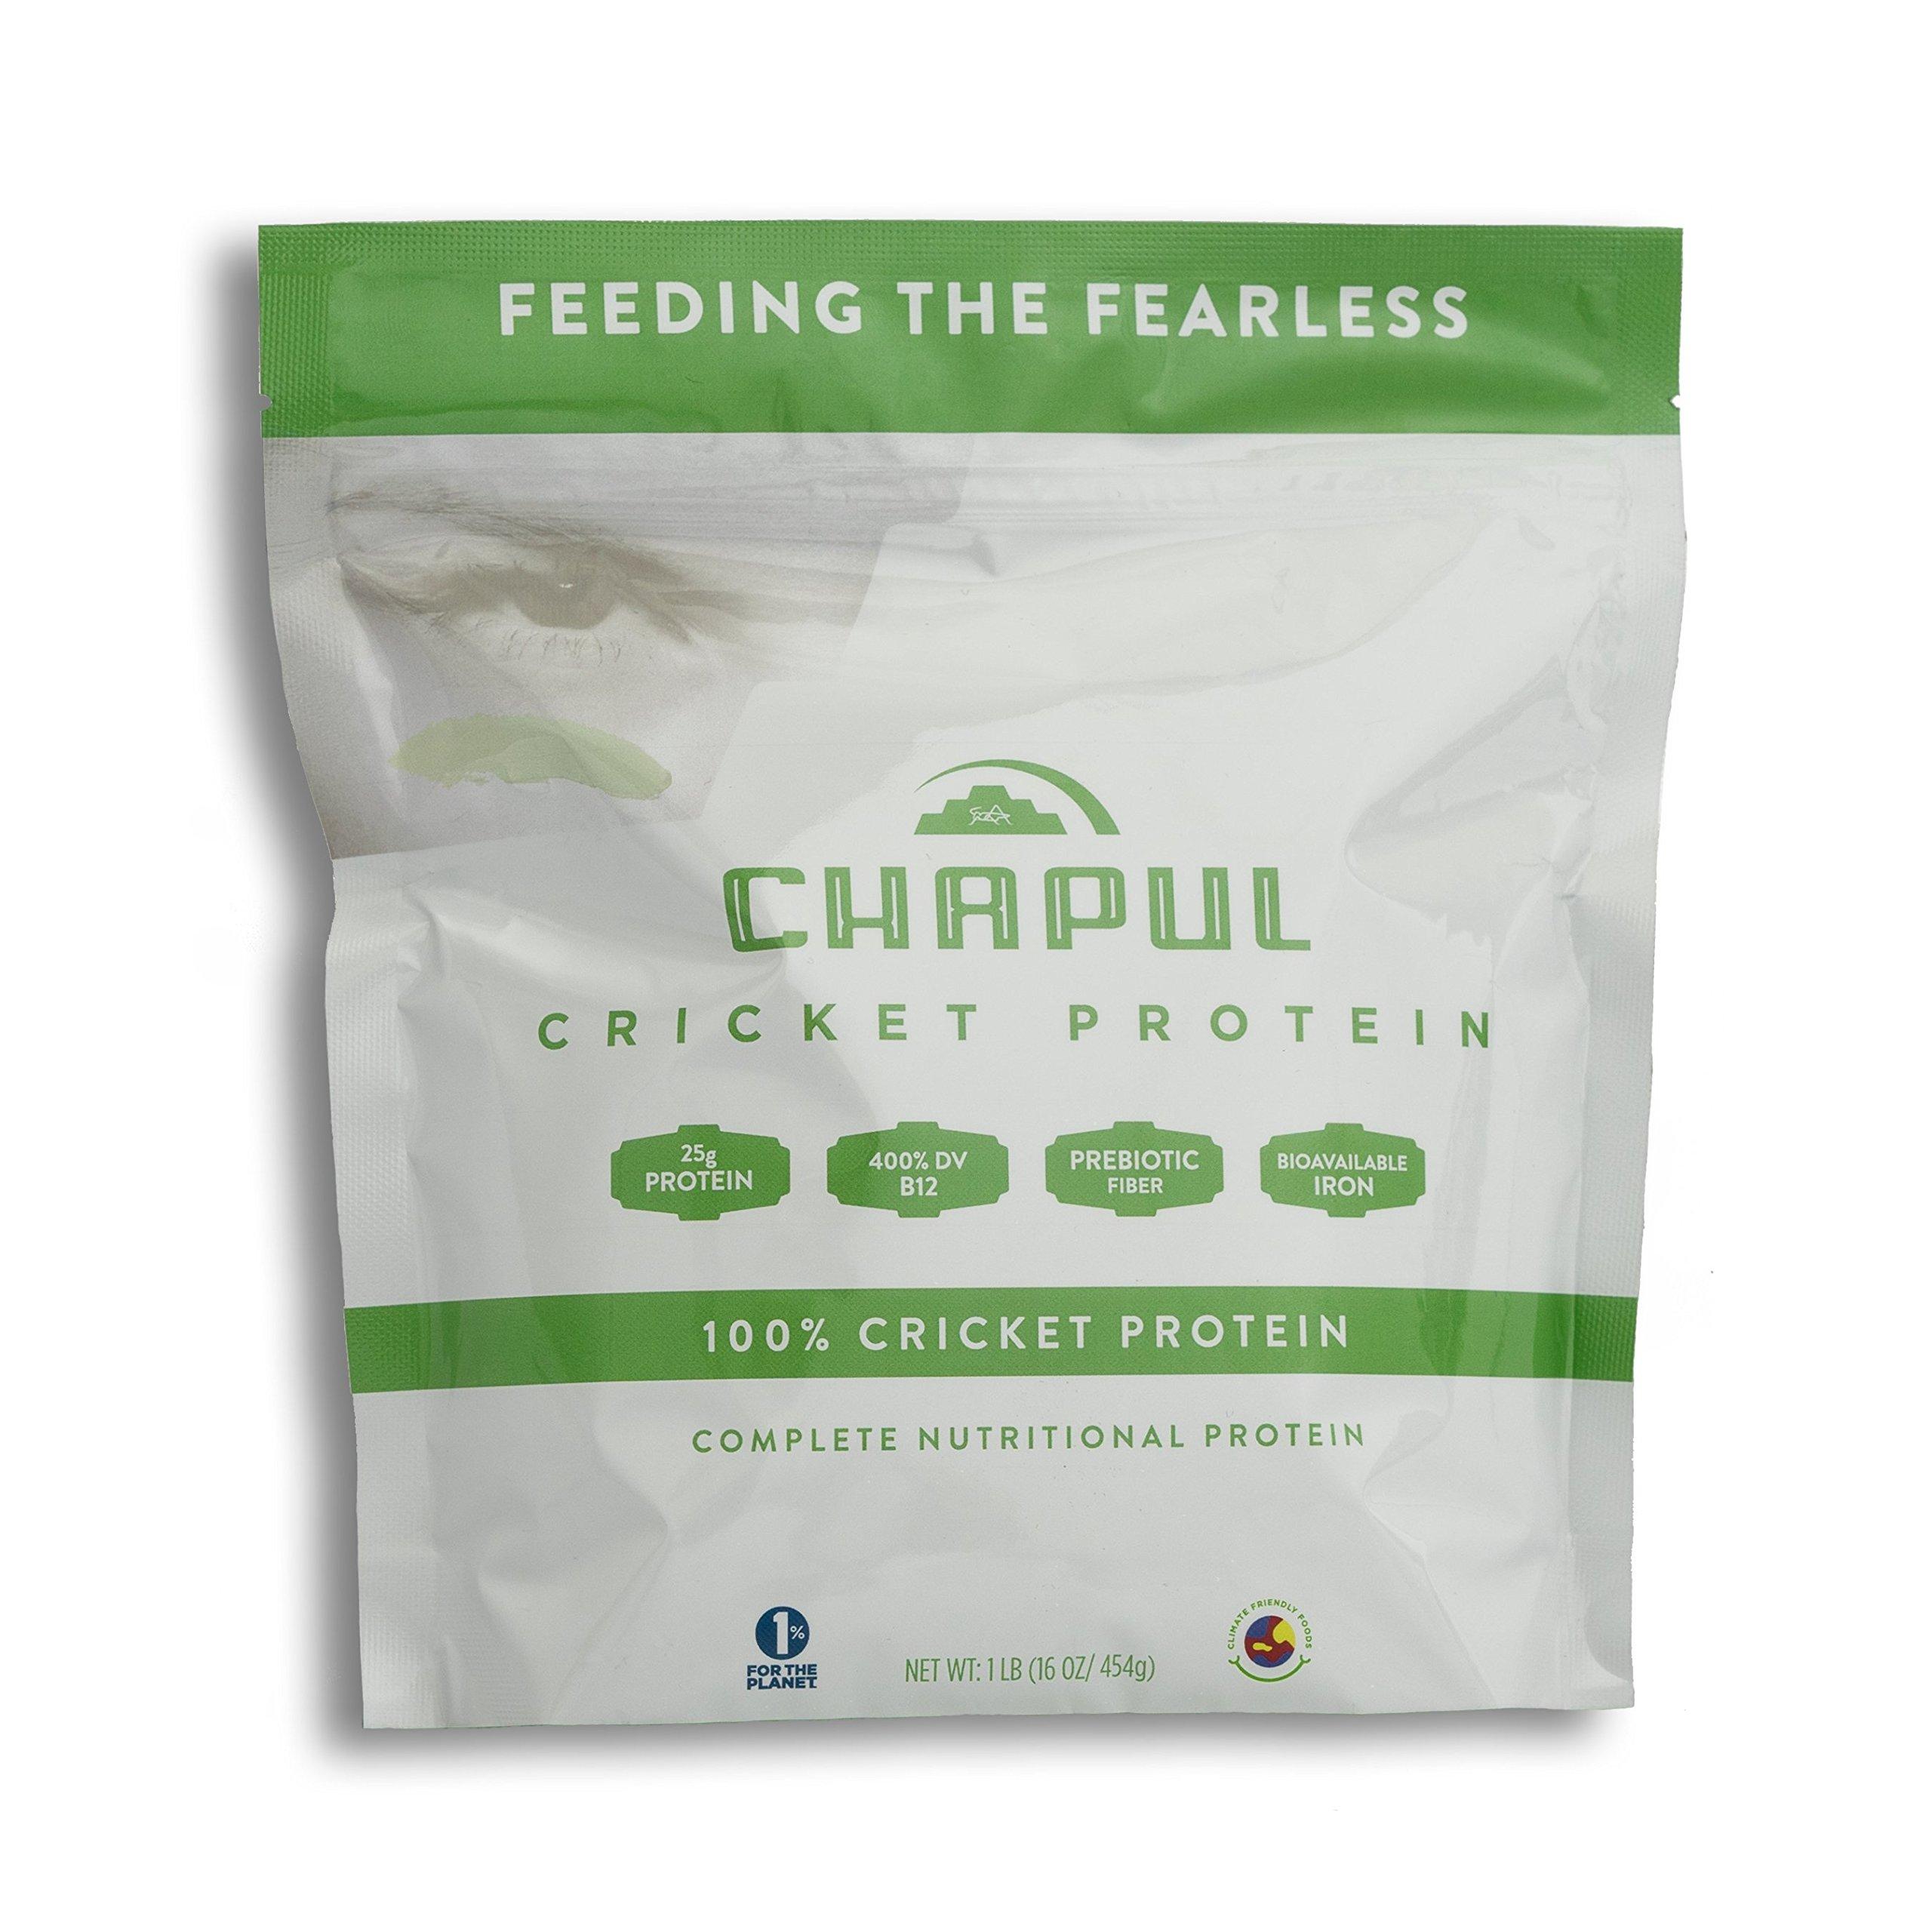 Chapul Cricket Protein Powder (Pure, 1 Pound) - 100% Cricket Flour, 25g Protein per Serving, High in Prebiotic Fiber, Sugar Free, 0 Net Carbs, Keto-Friendly by Chapul